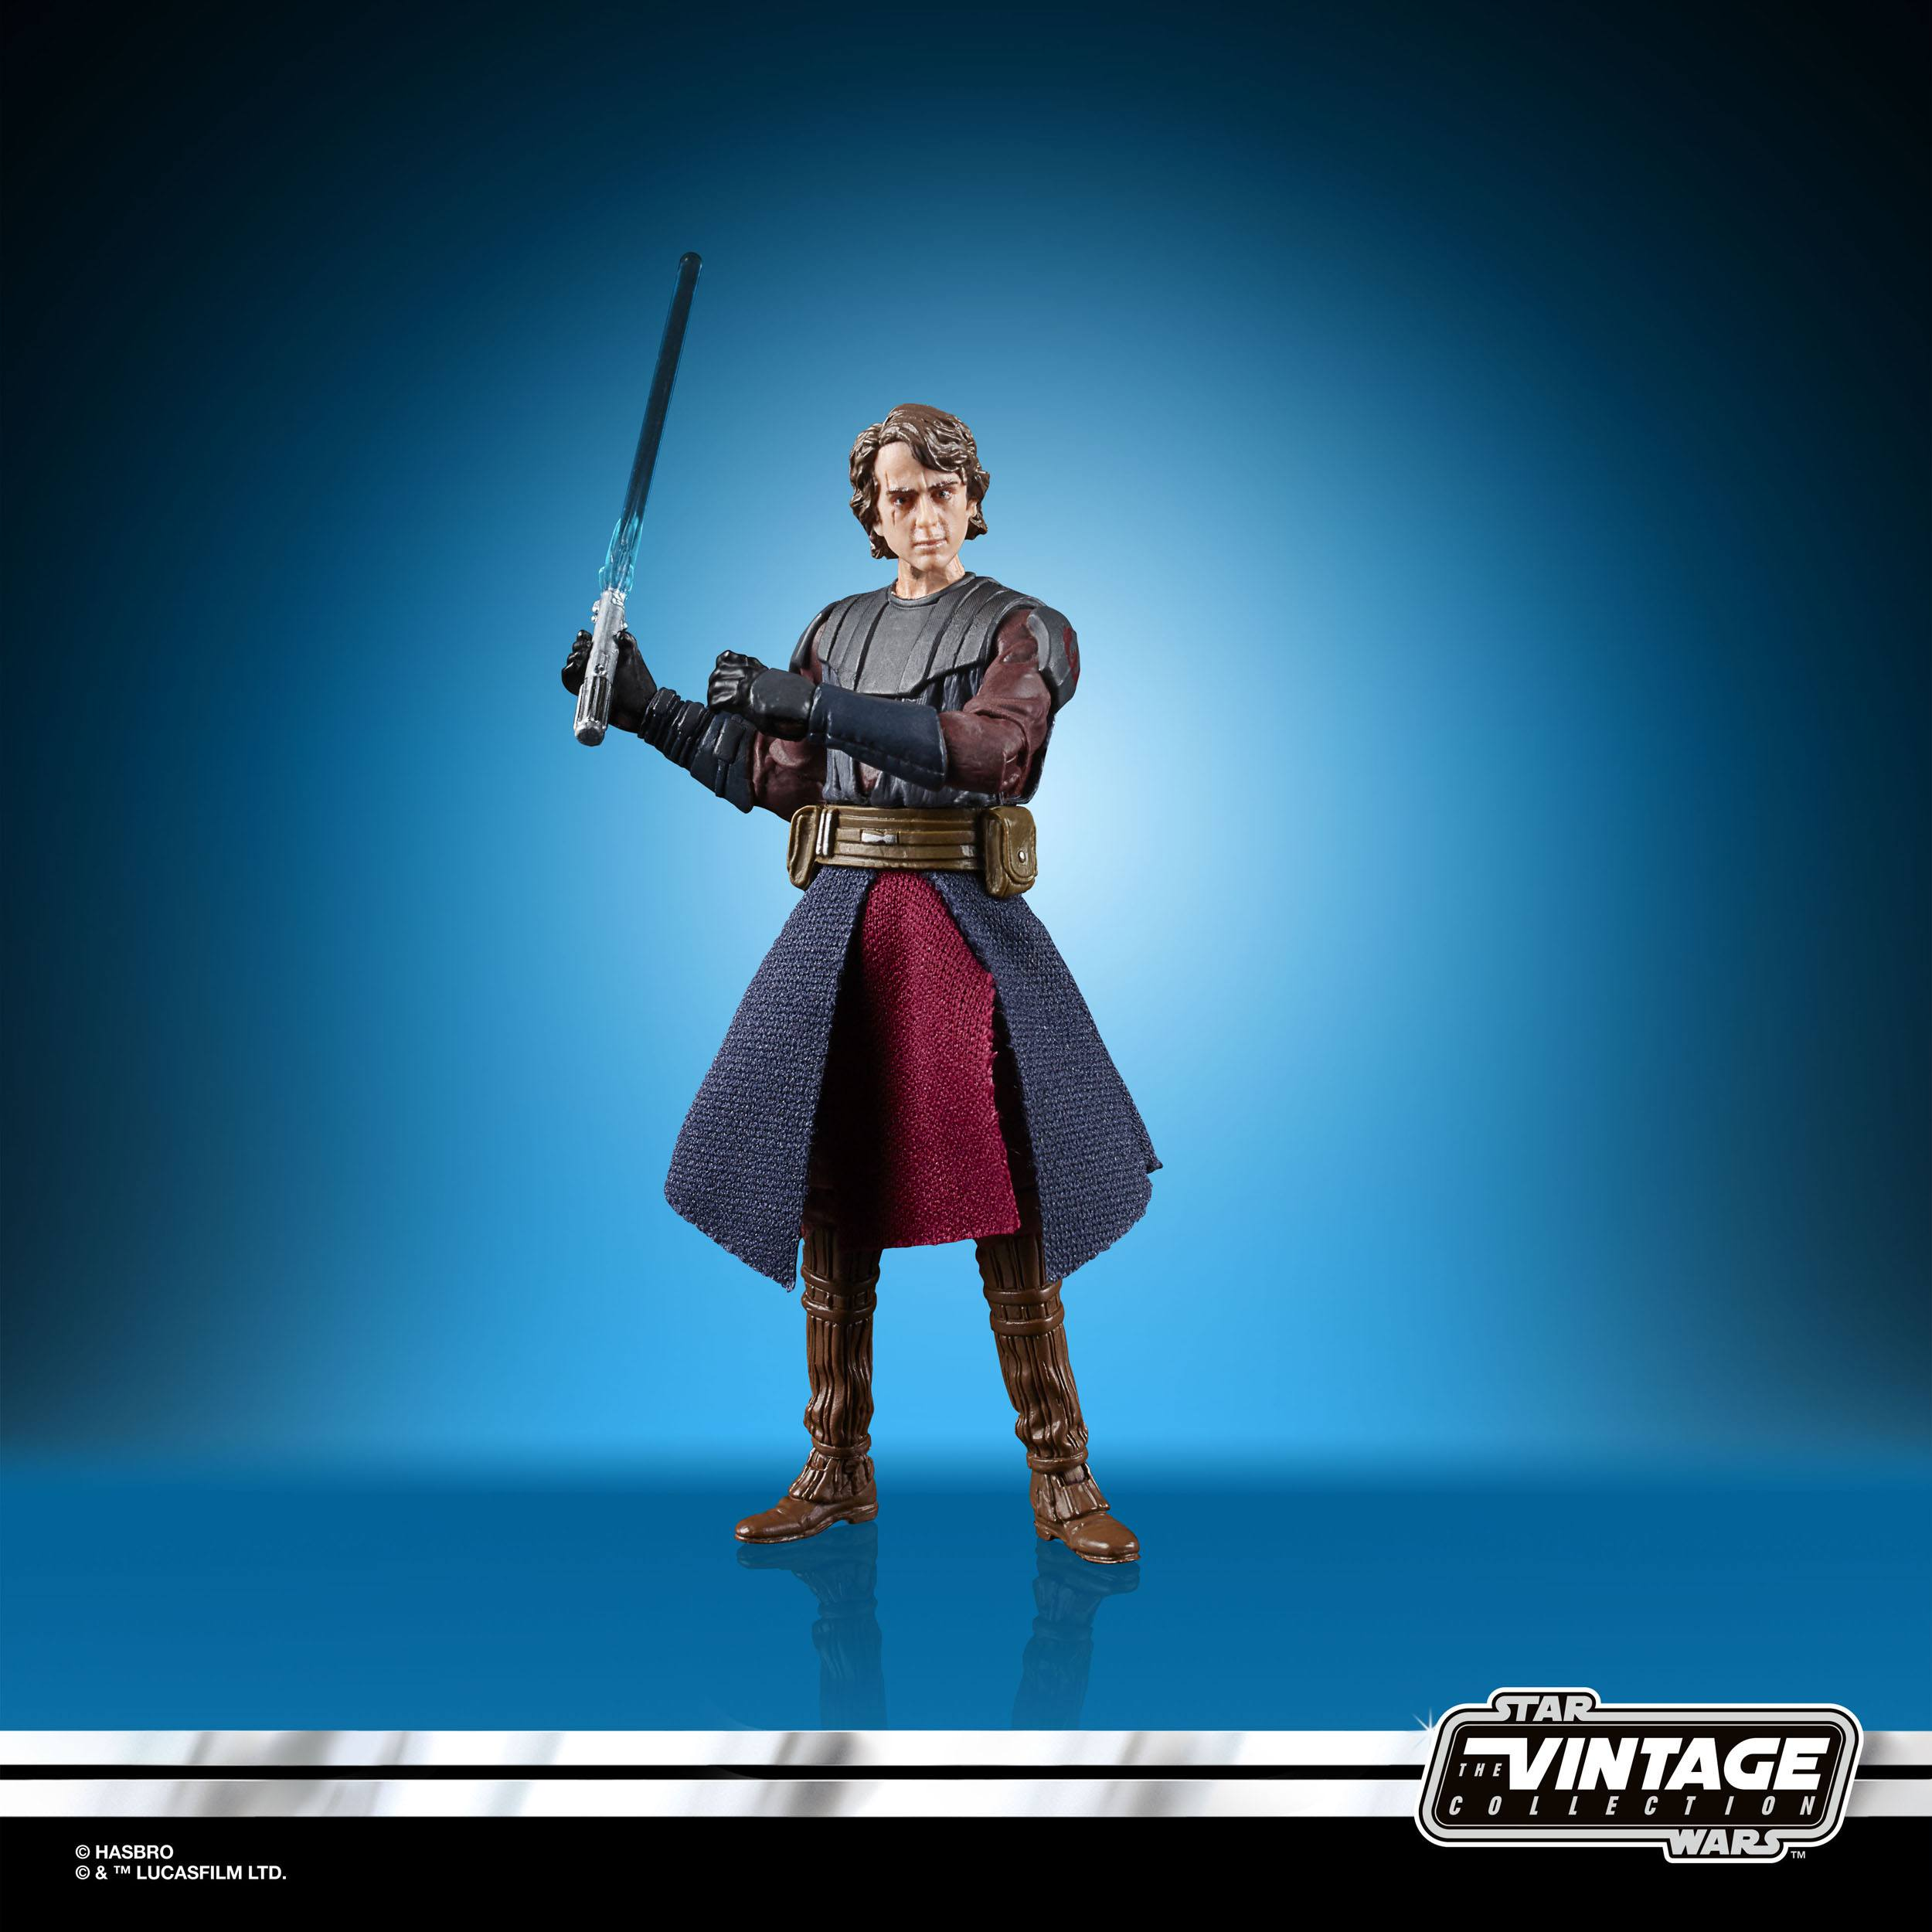 Star Wars The Vintage Collection Anakin Skywalker 10cm E9576  5010993749577